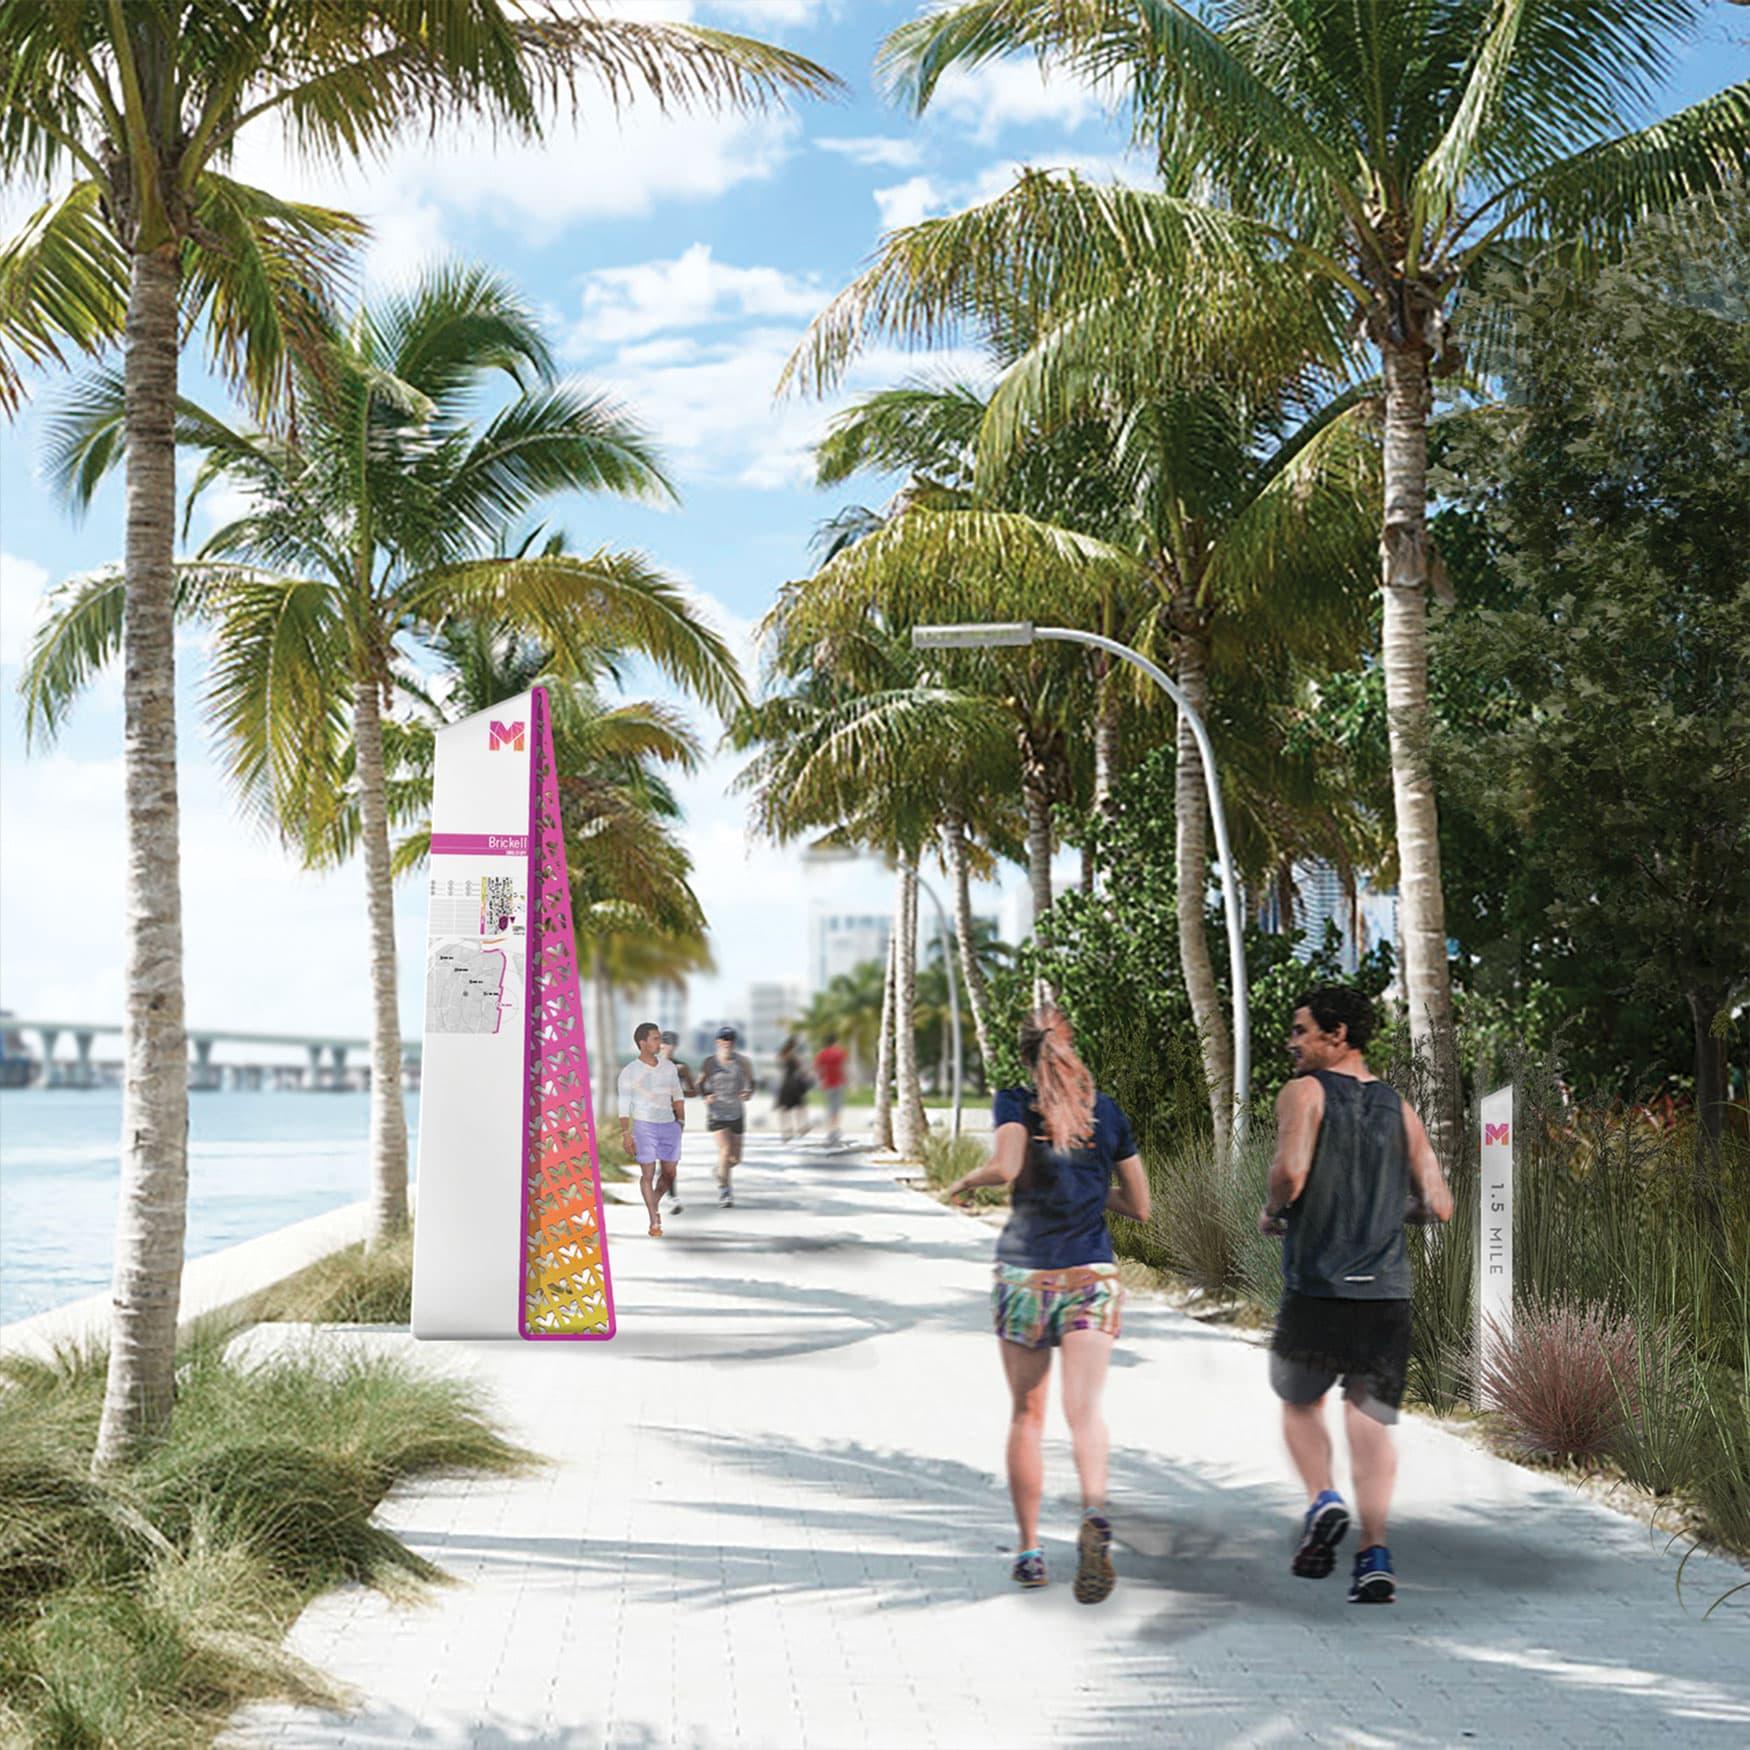 Wayfinding signage along the waterfront walkway of Miami Baywalk.